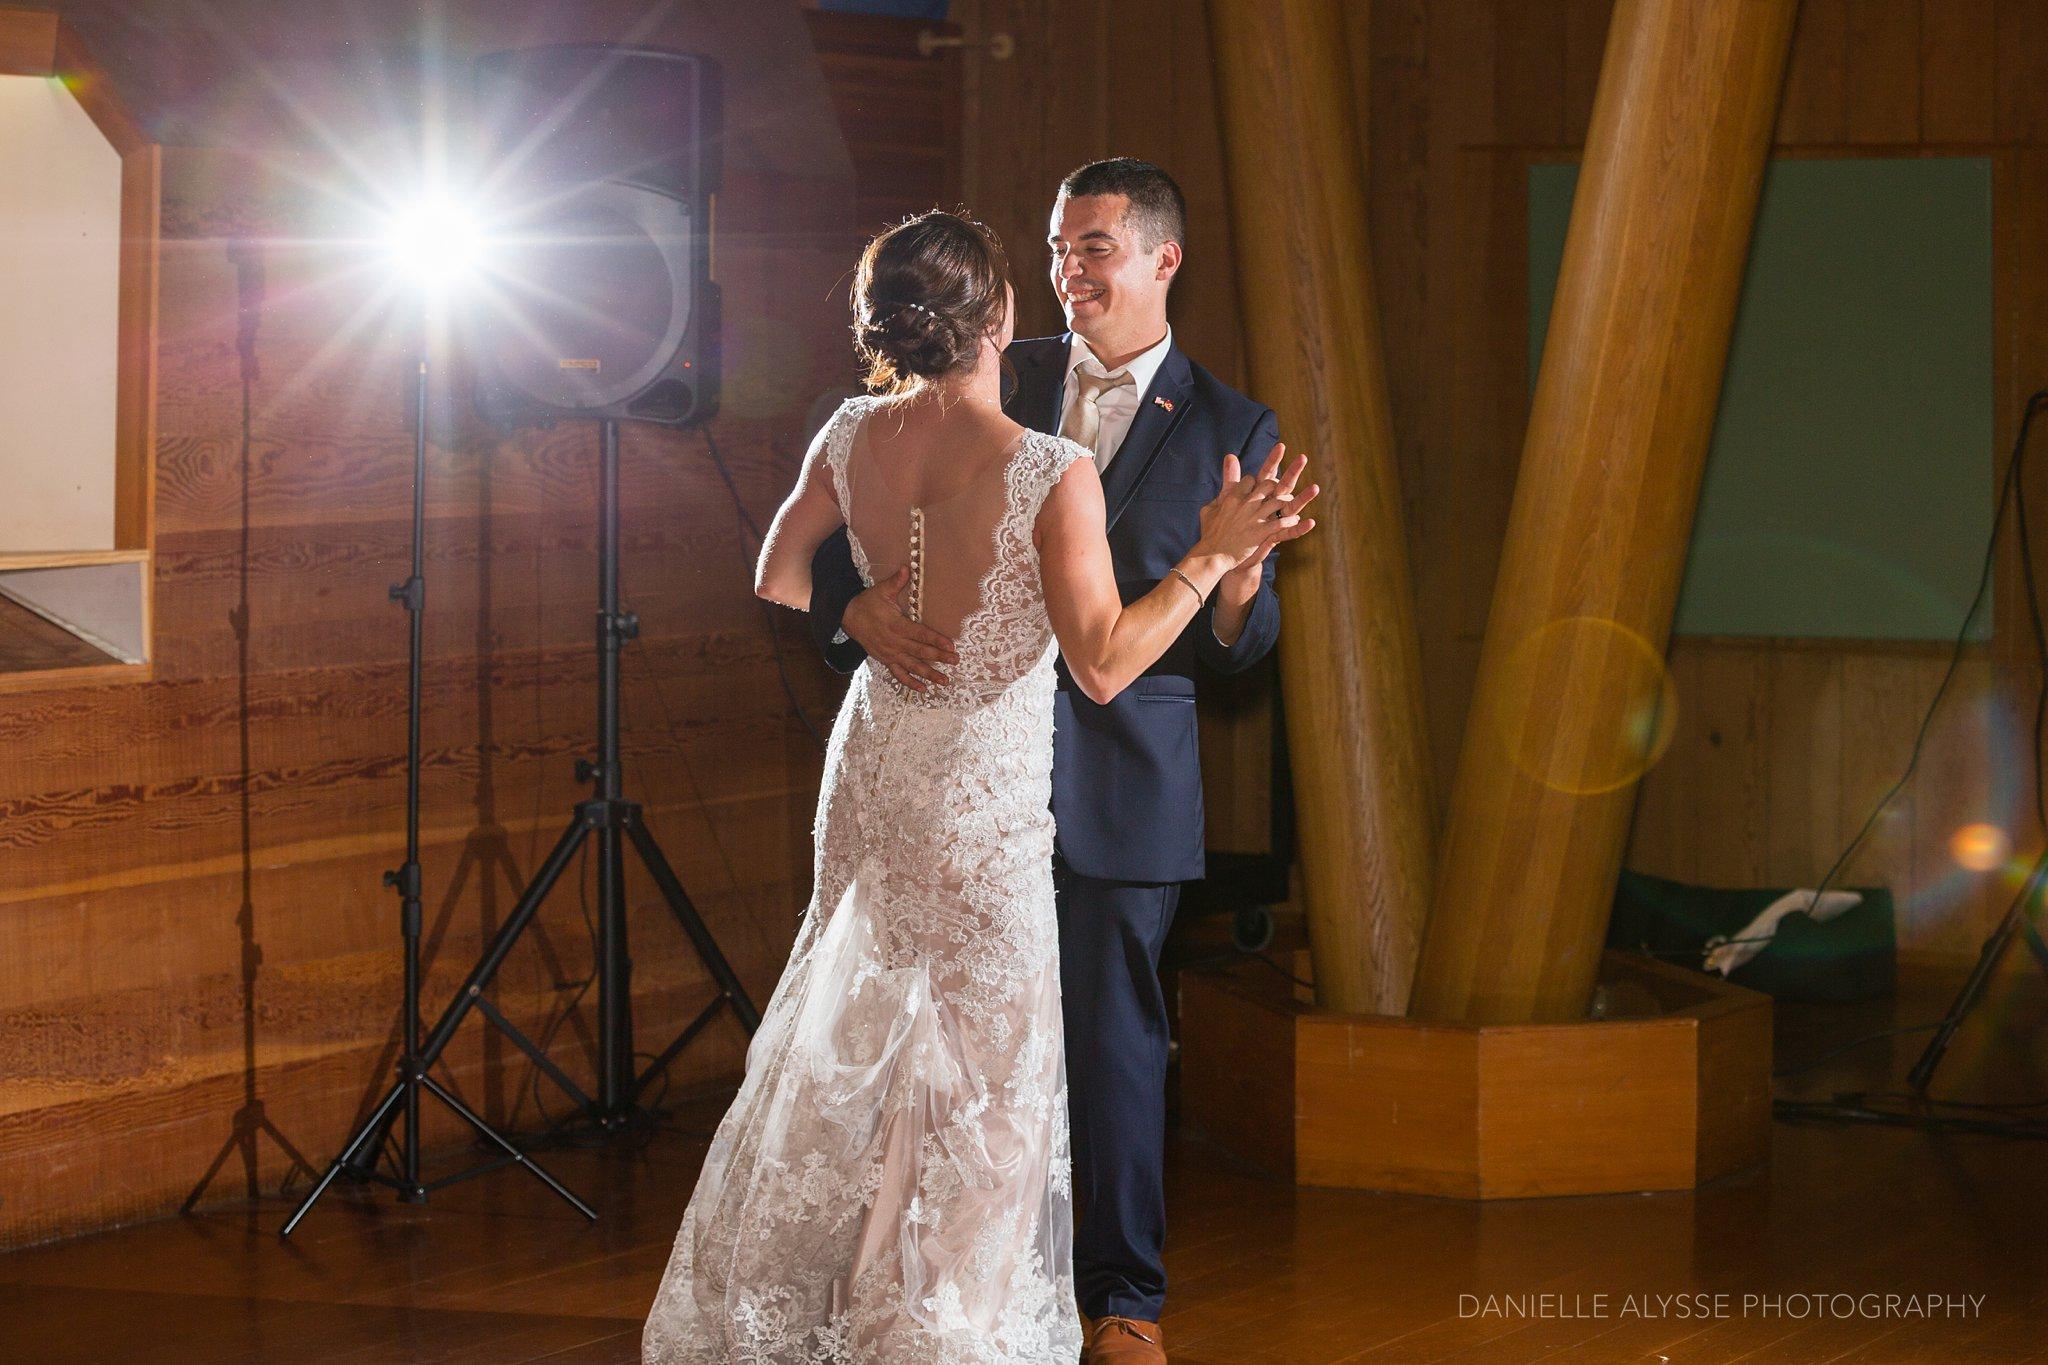 170429_blog_kimberly_ben_wedding_san_mateo_curiodyssey_danielle_alysse_photography_sacramento_photographer0803_WEB.jpg